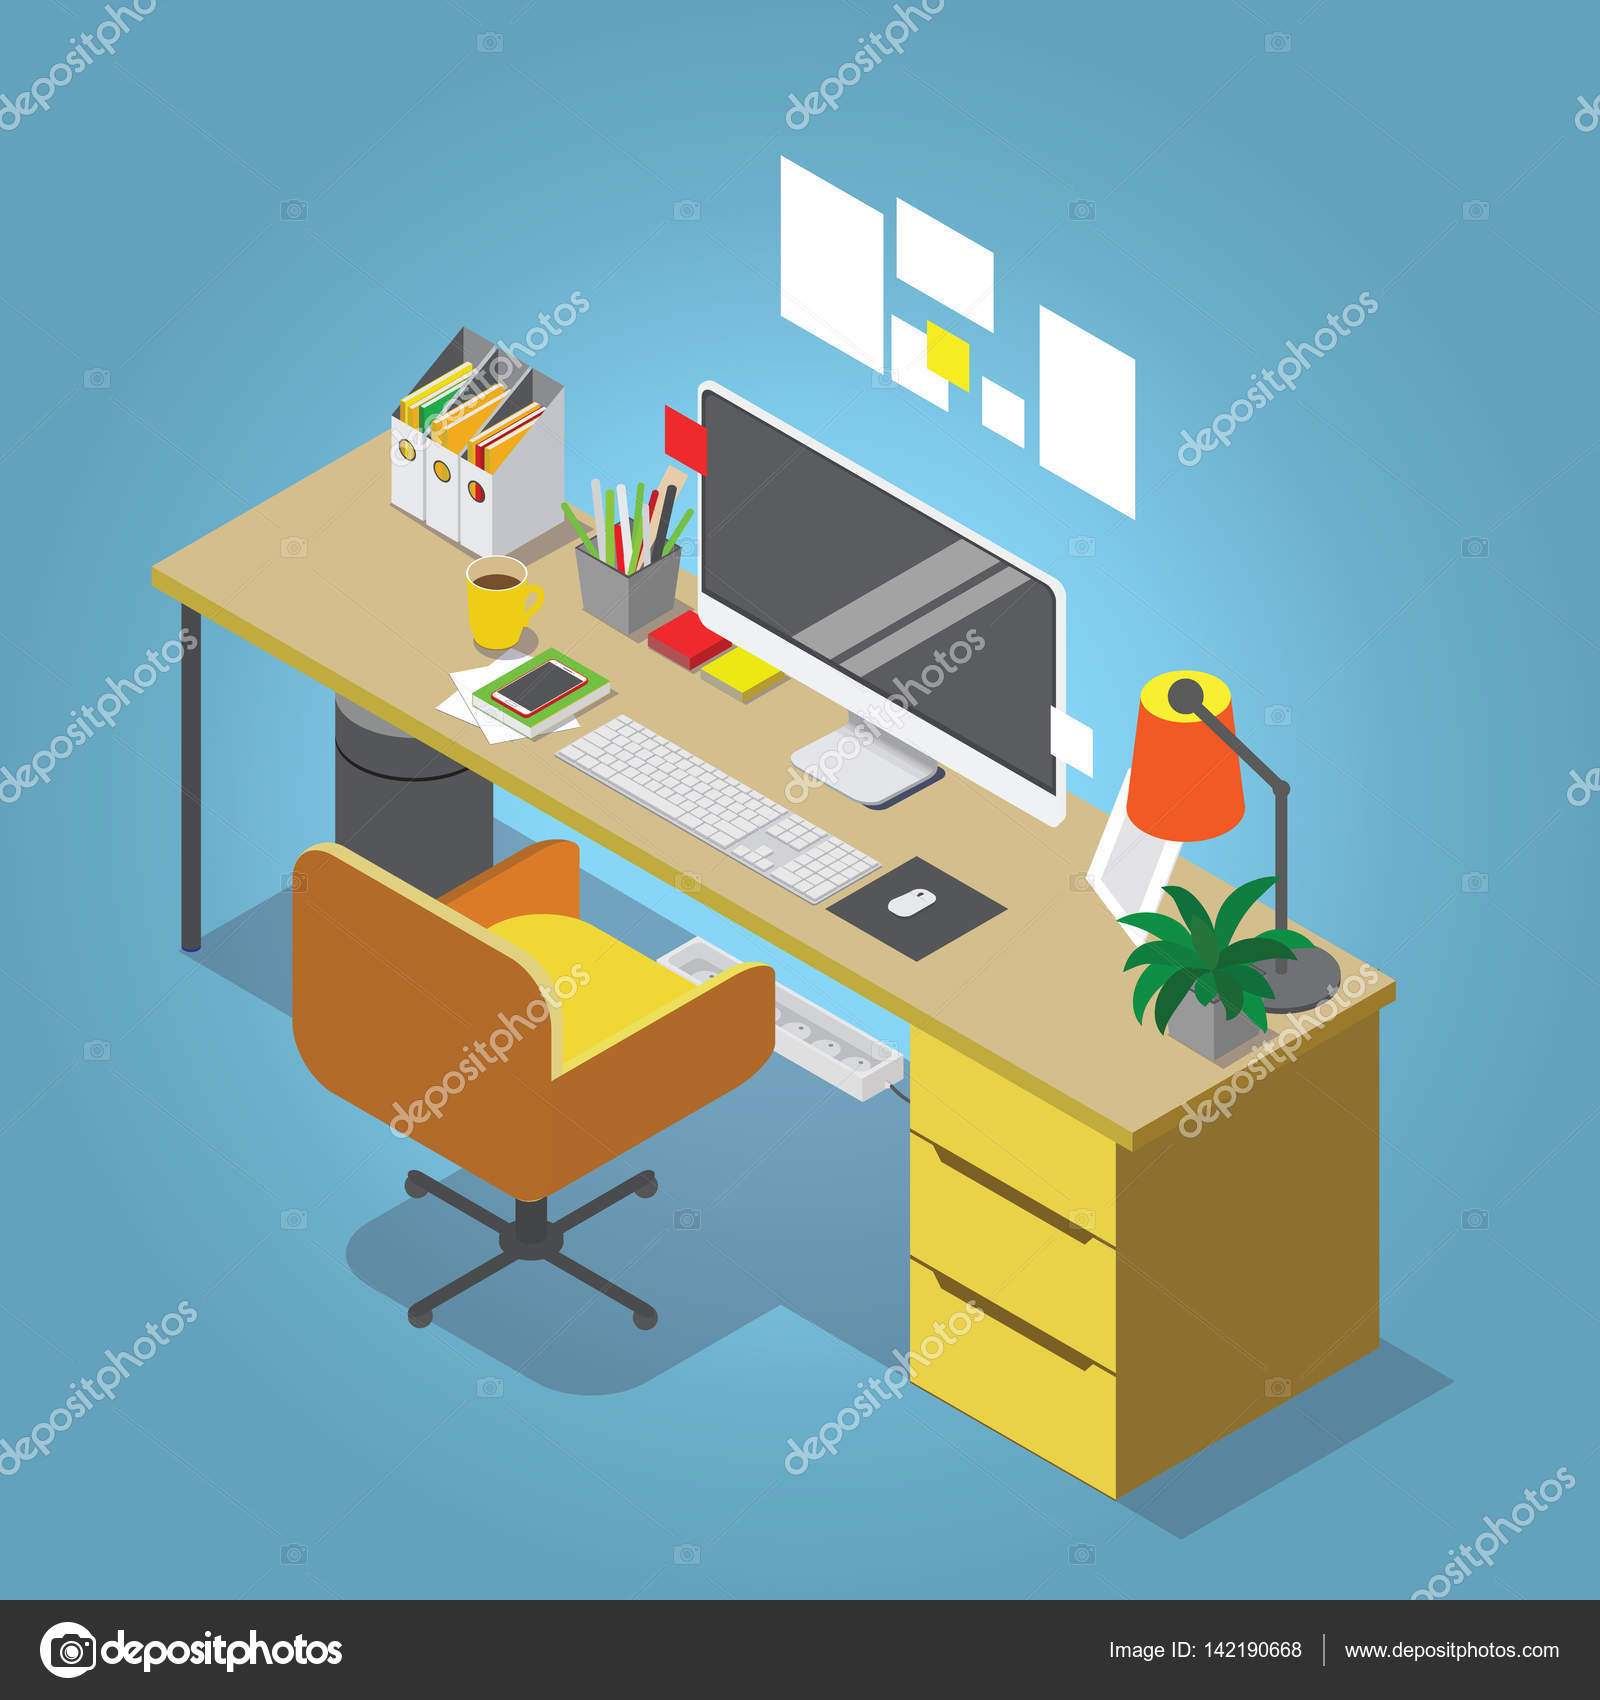 Workplace Interior Set Office Table Modern Chair Desktop Computer Lamp Trash Basket Books Keyboard Vector By Vasilixa